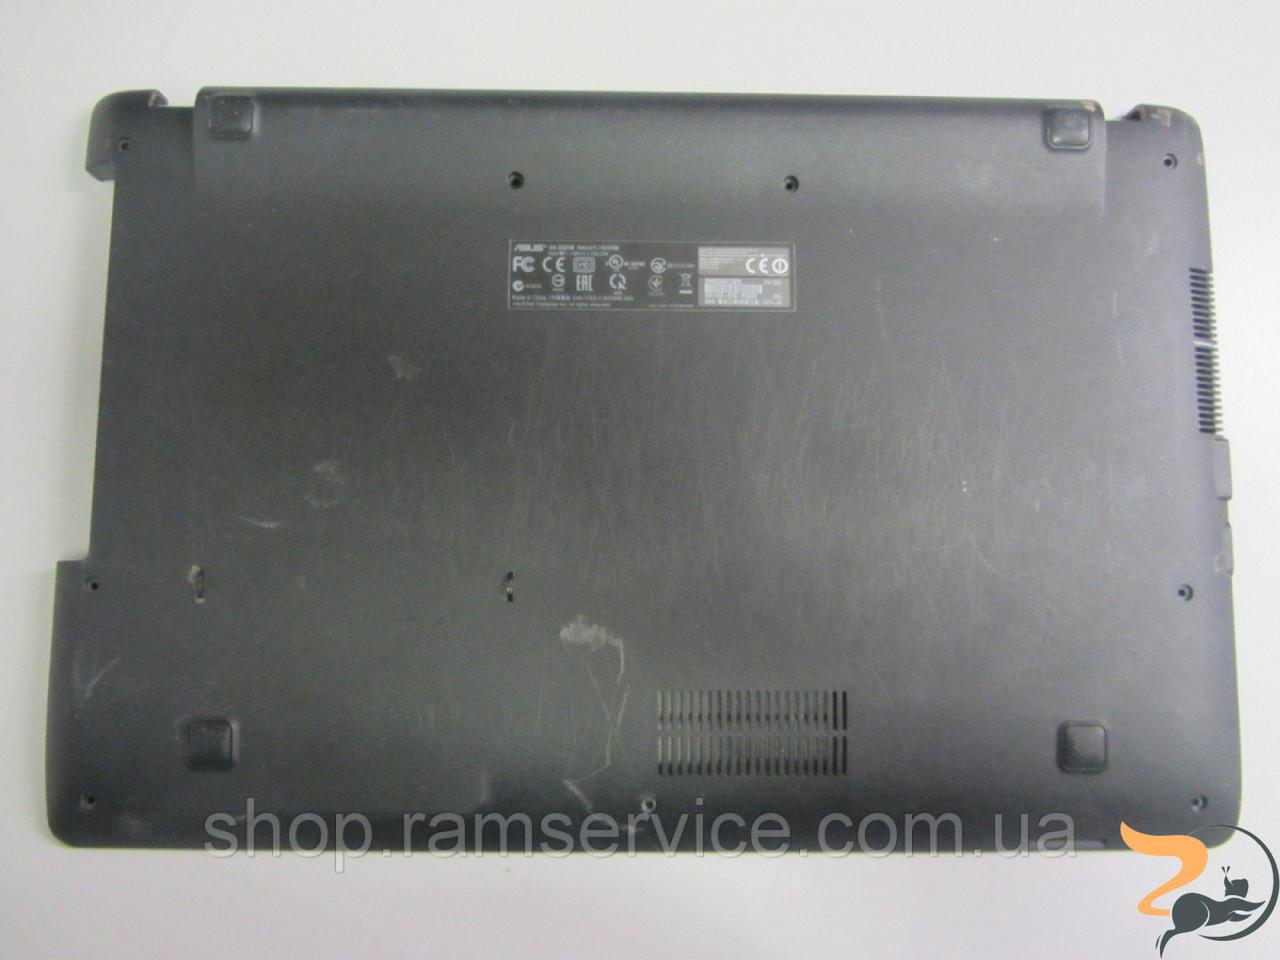 Нижня частина корпуса для ноутбука Asus X551M, б/в